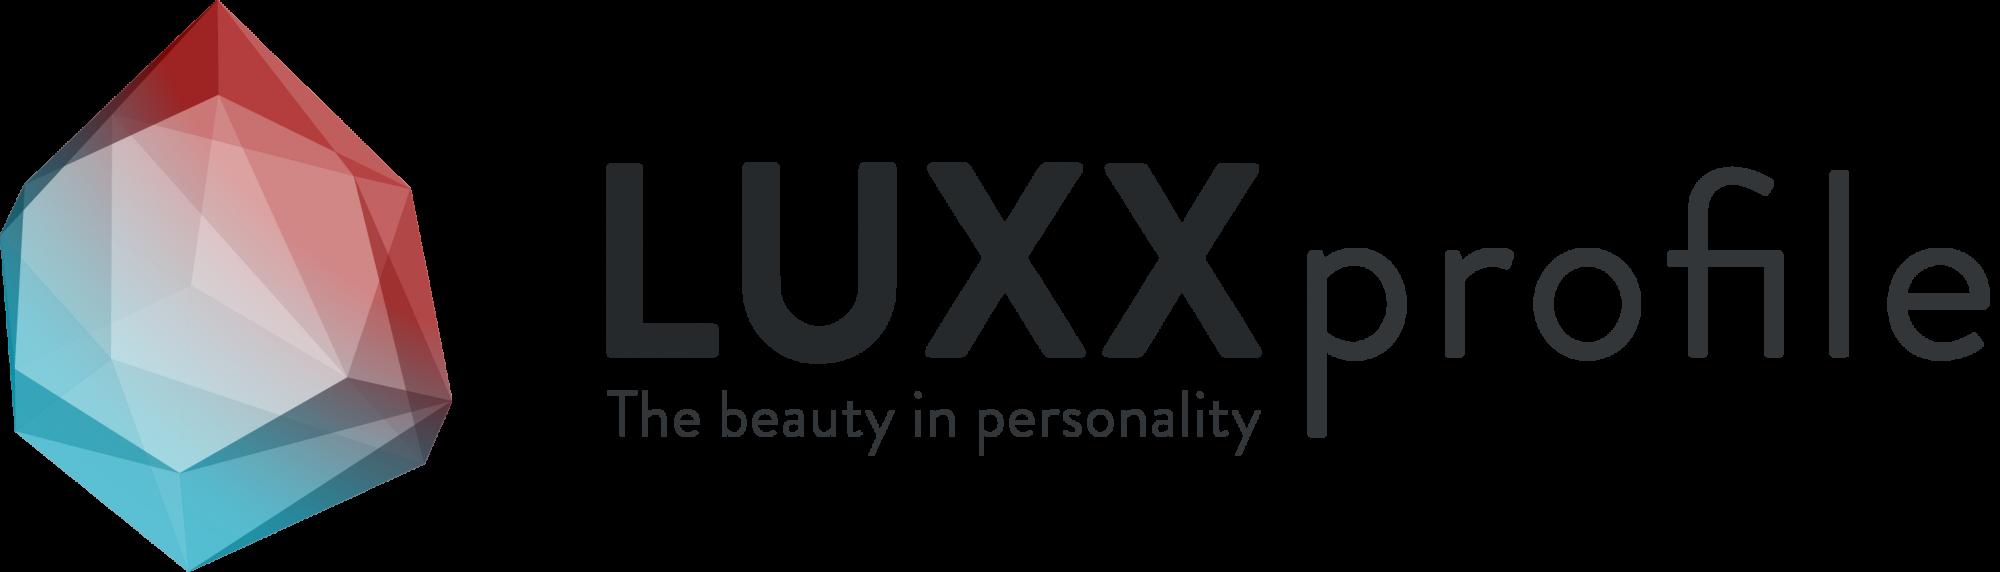 LUXXprofile_Logo_Claim_RGB